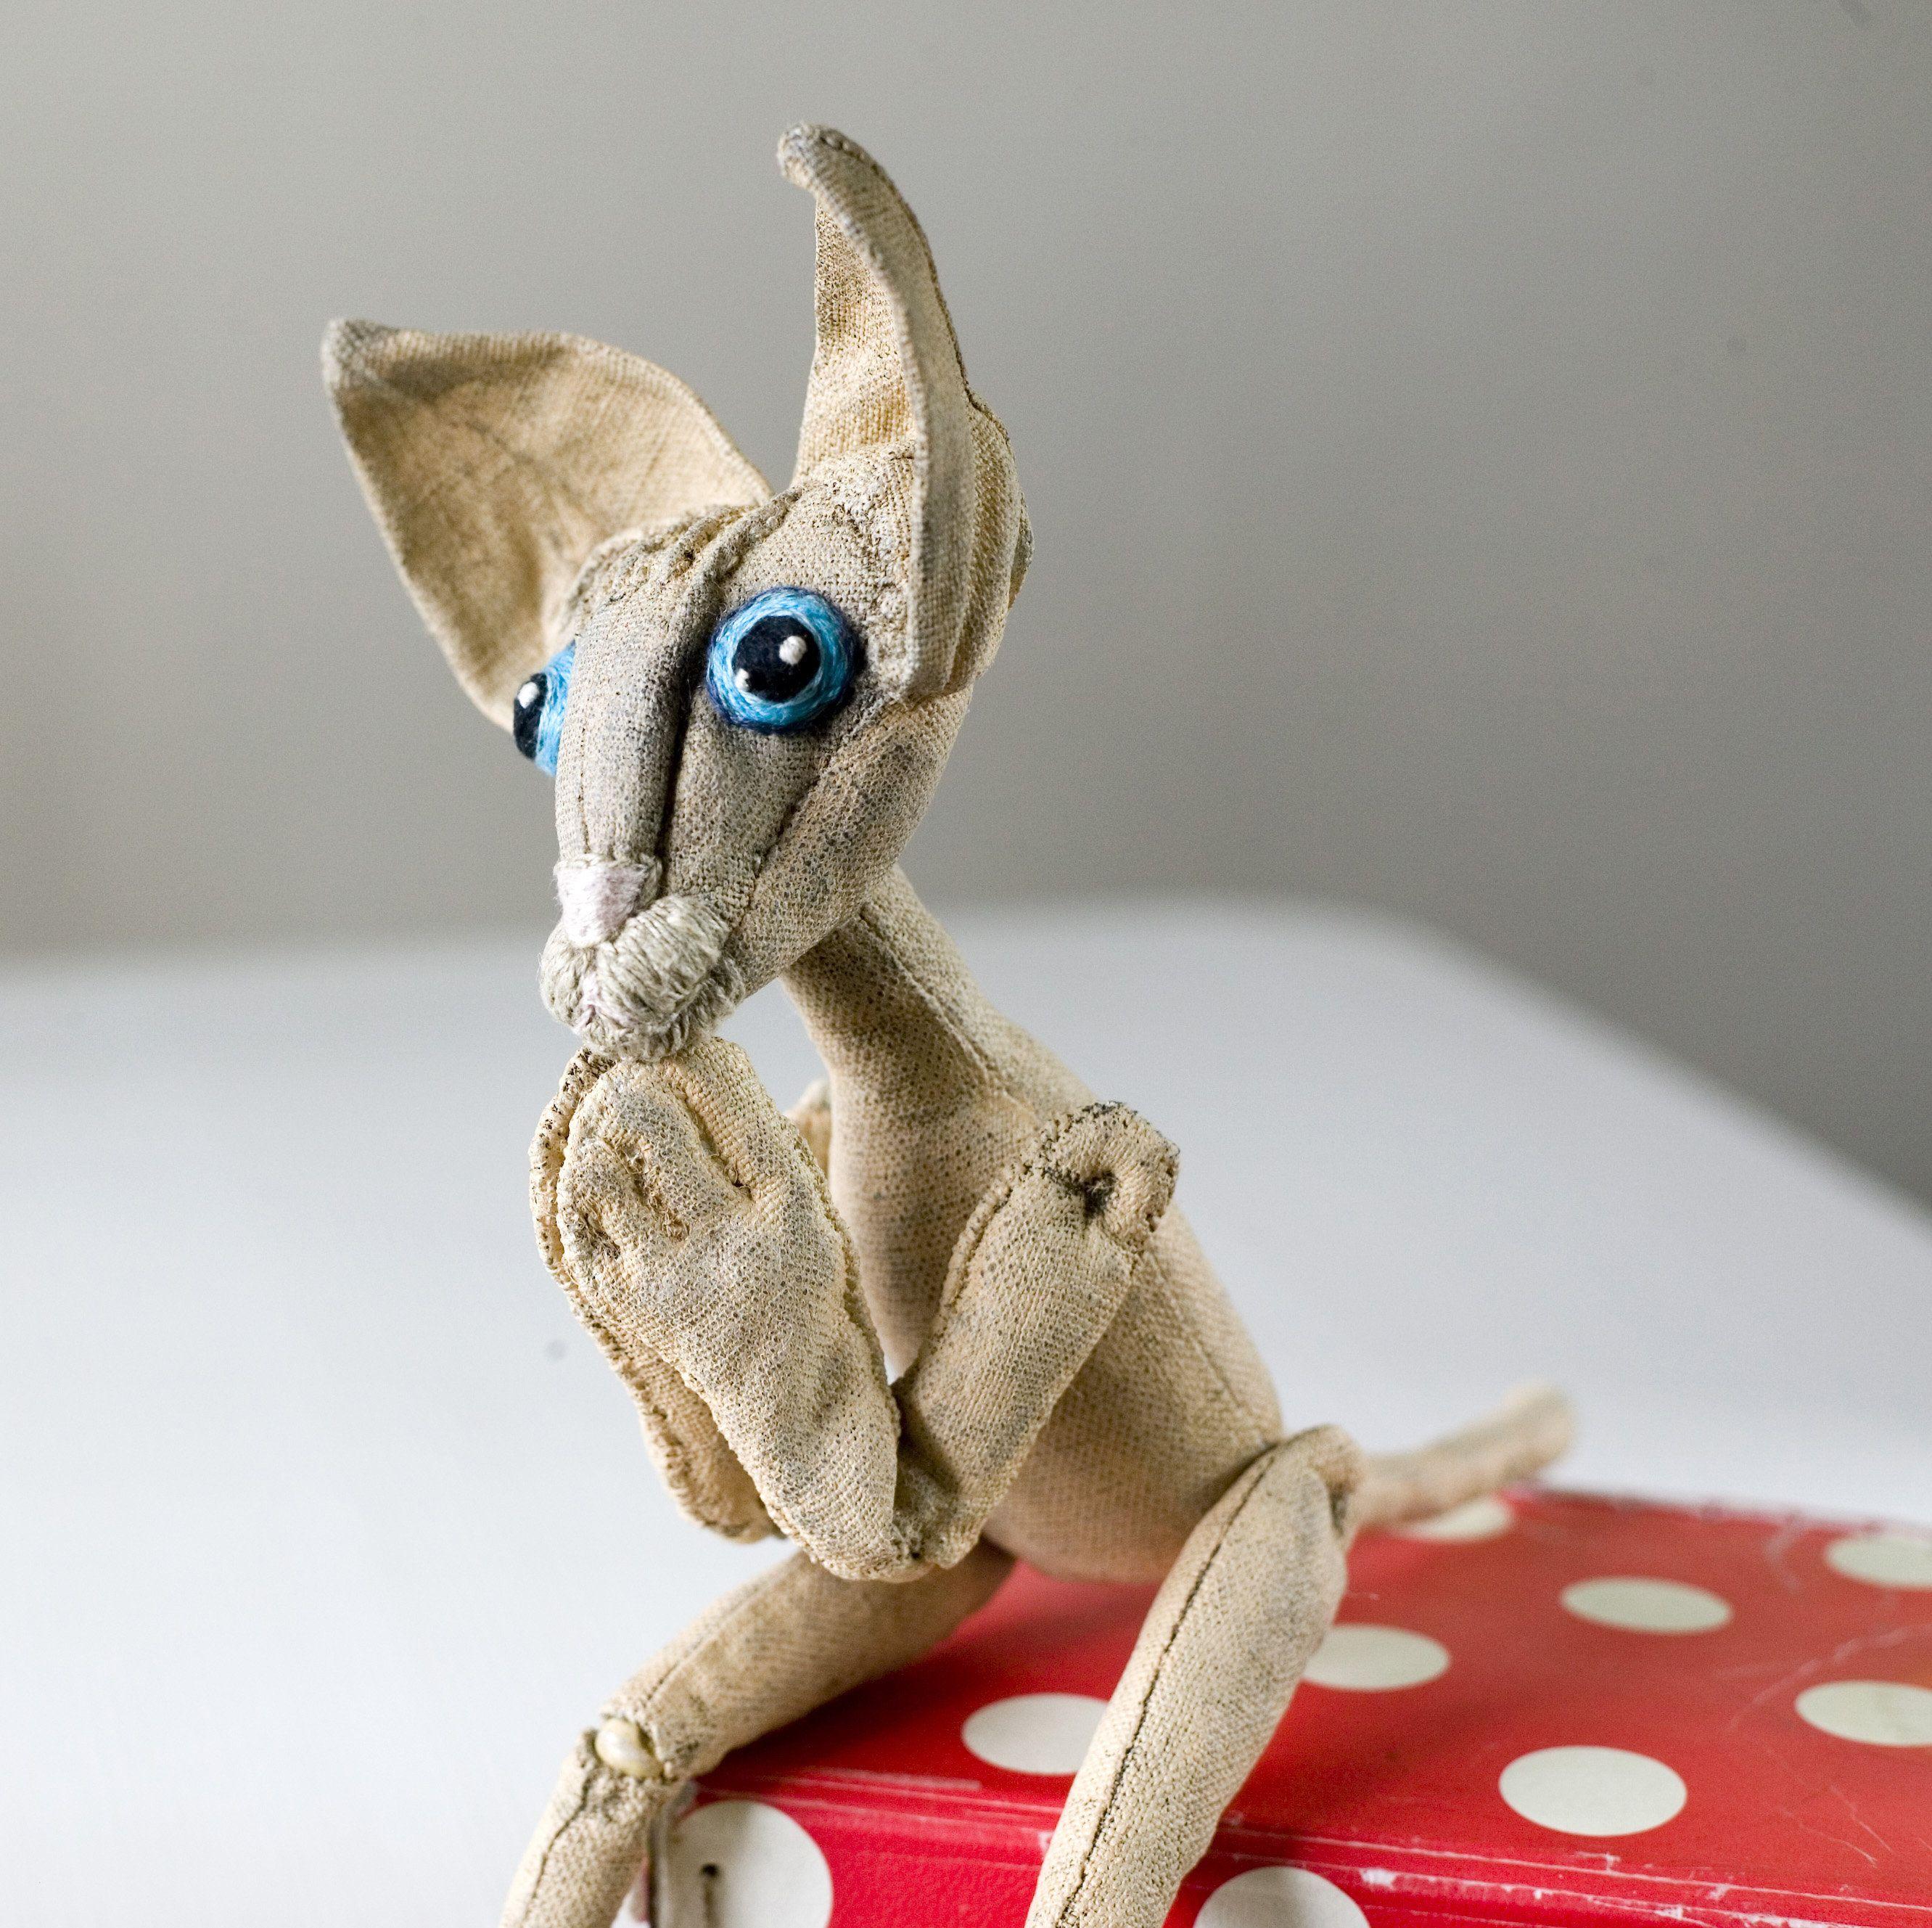 Sphynx cat by KTZAY ポートレート art Sphynxcat cutecat